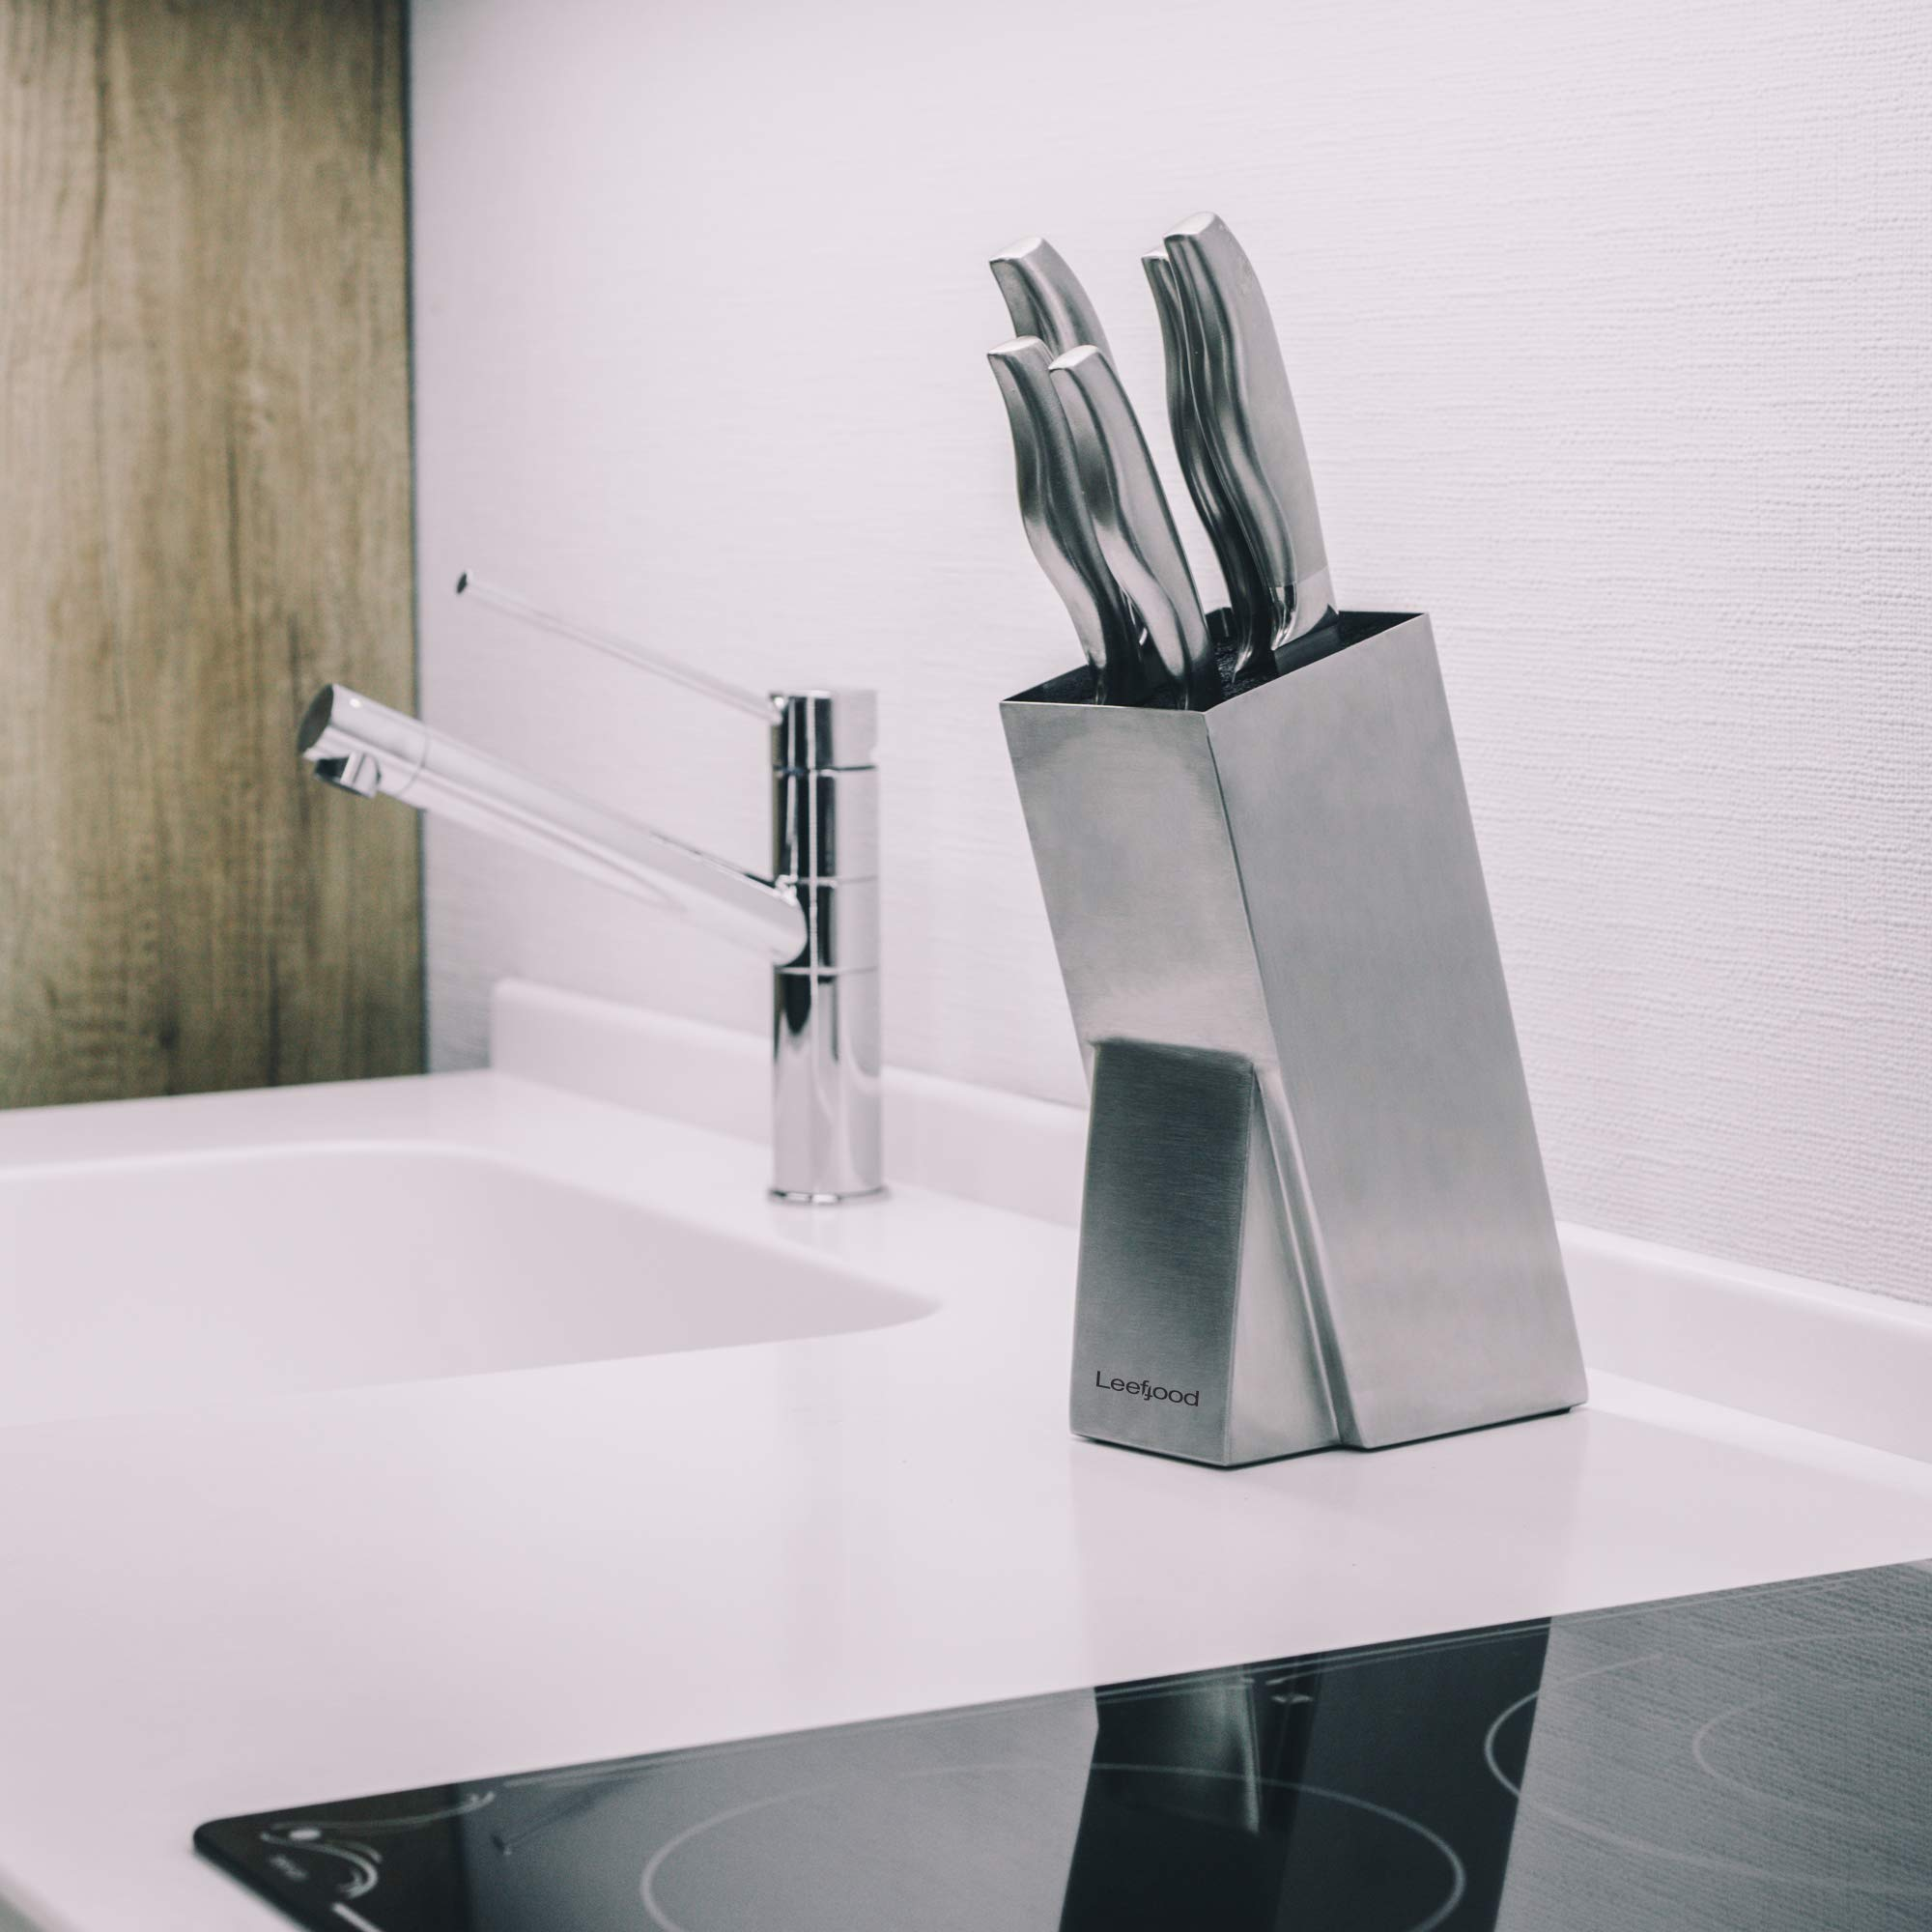 Universal Stainless Steel Knife Block Organizer – For Safe Kitchen Knife Holder Easy Clean Dishwasher Safe – Space Saver Knife Storage Stand by Leeffood (Image #6)